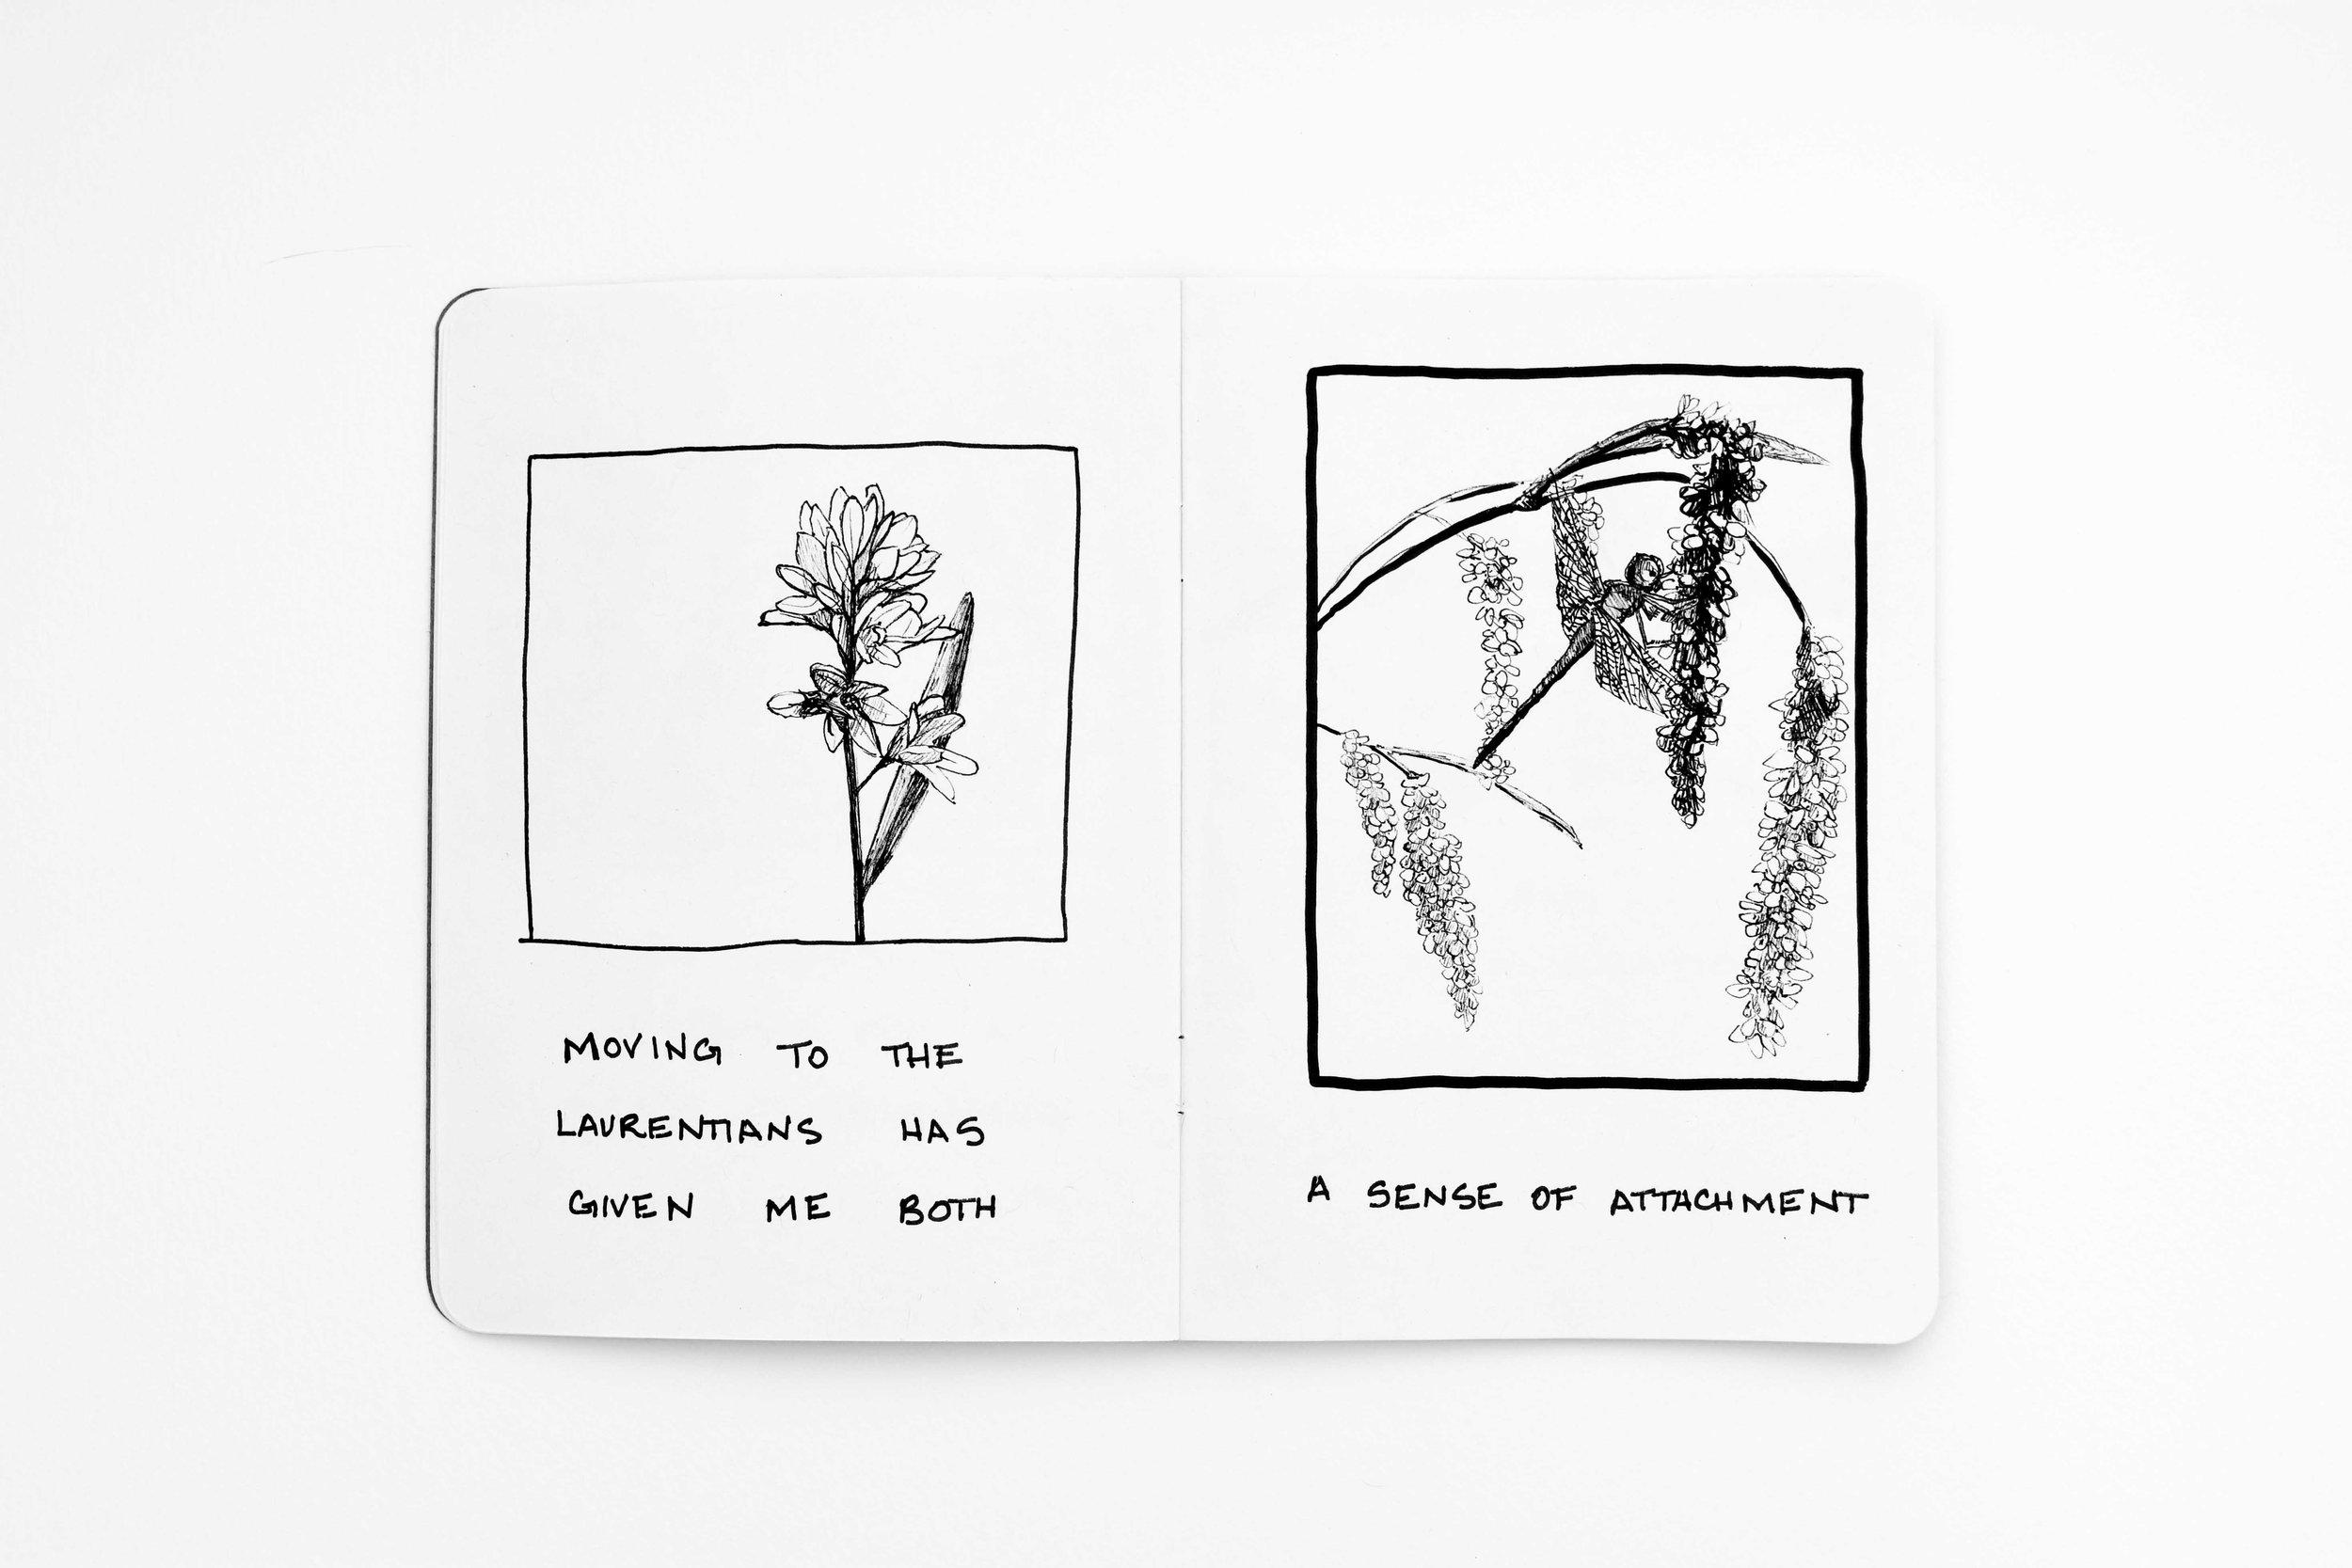 tiffany-moore-sketchbook-landscape (4 of 13).jpg